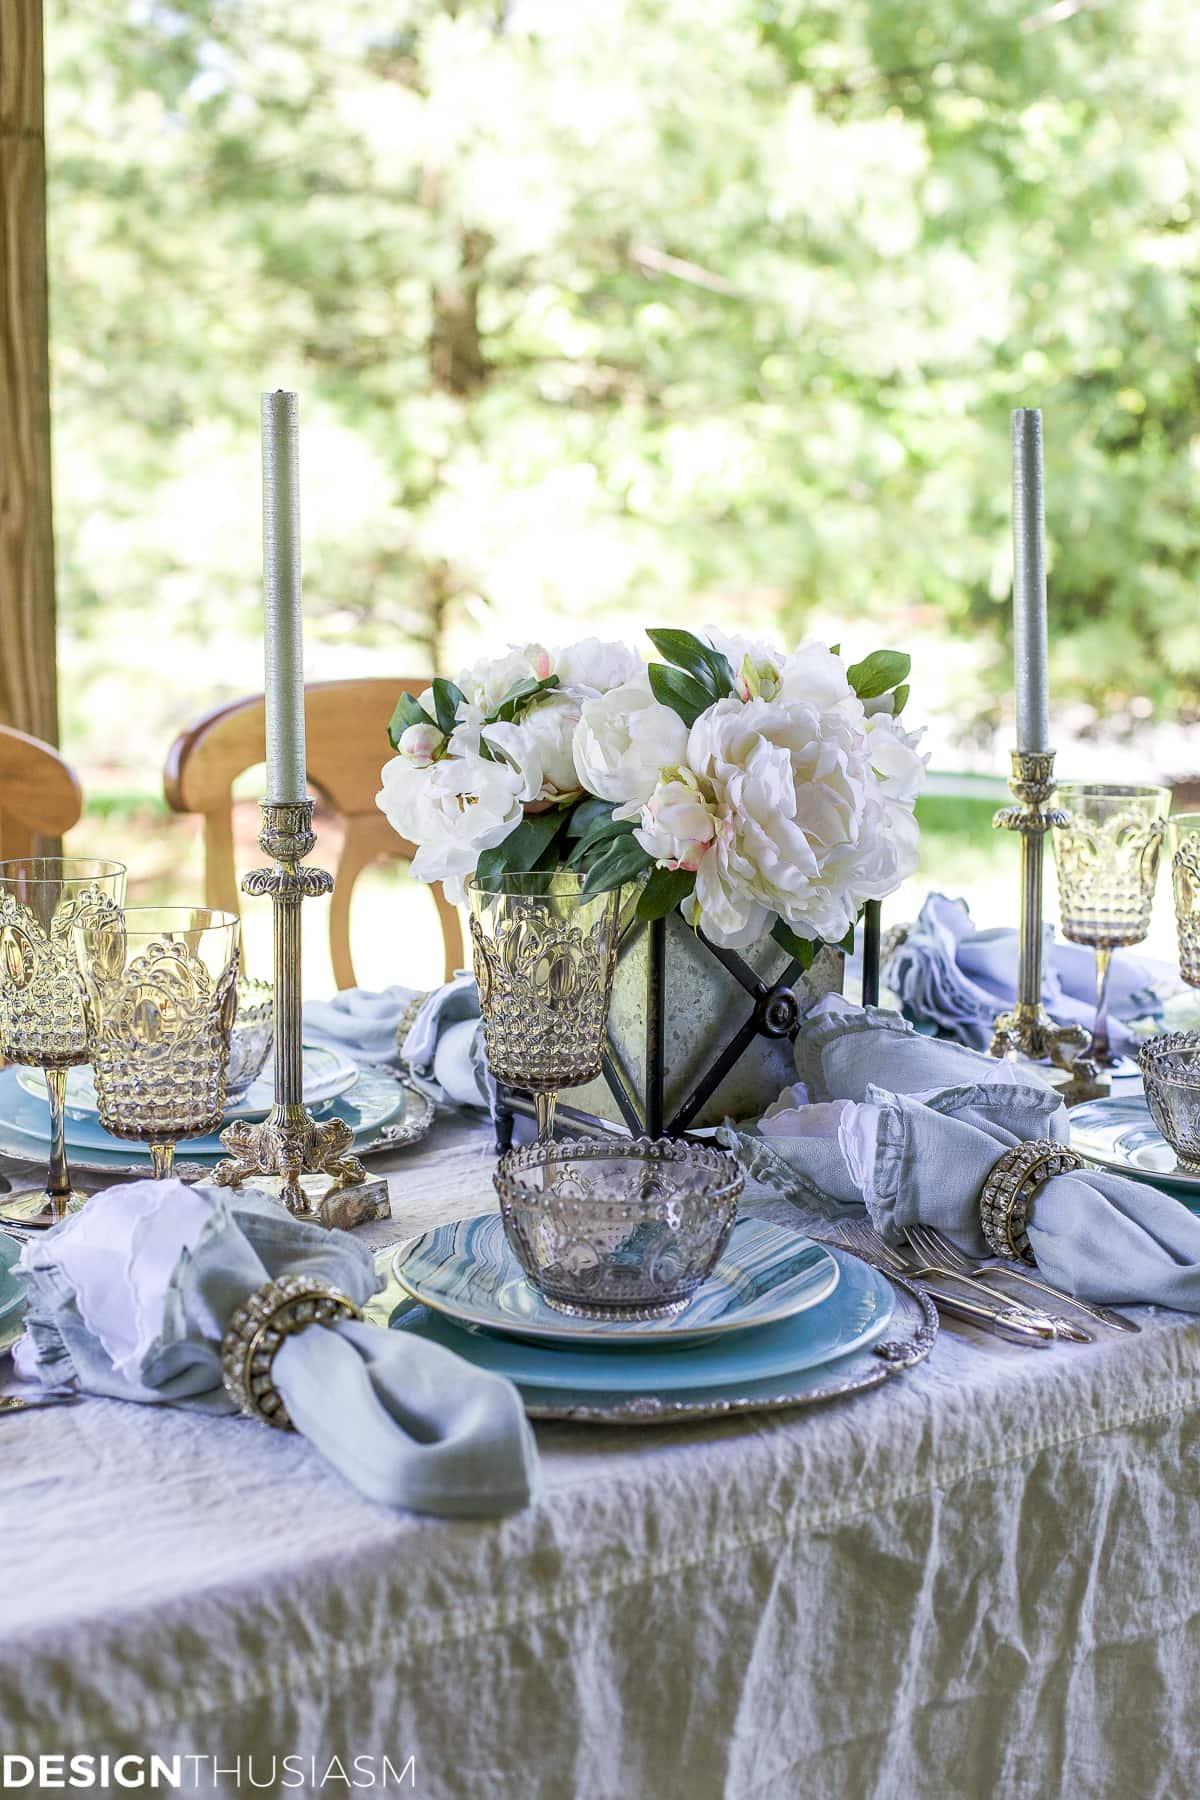 Seaside Decor | Setting a Summer Table with Coastal Dinnerware - designthusiasm.com